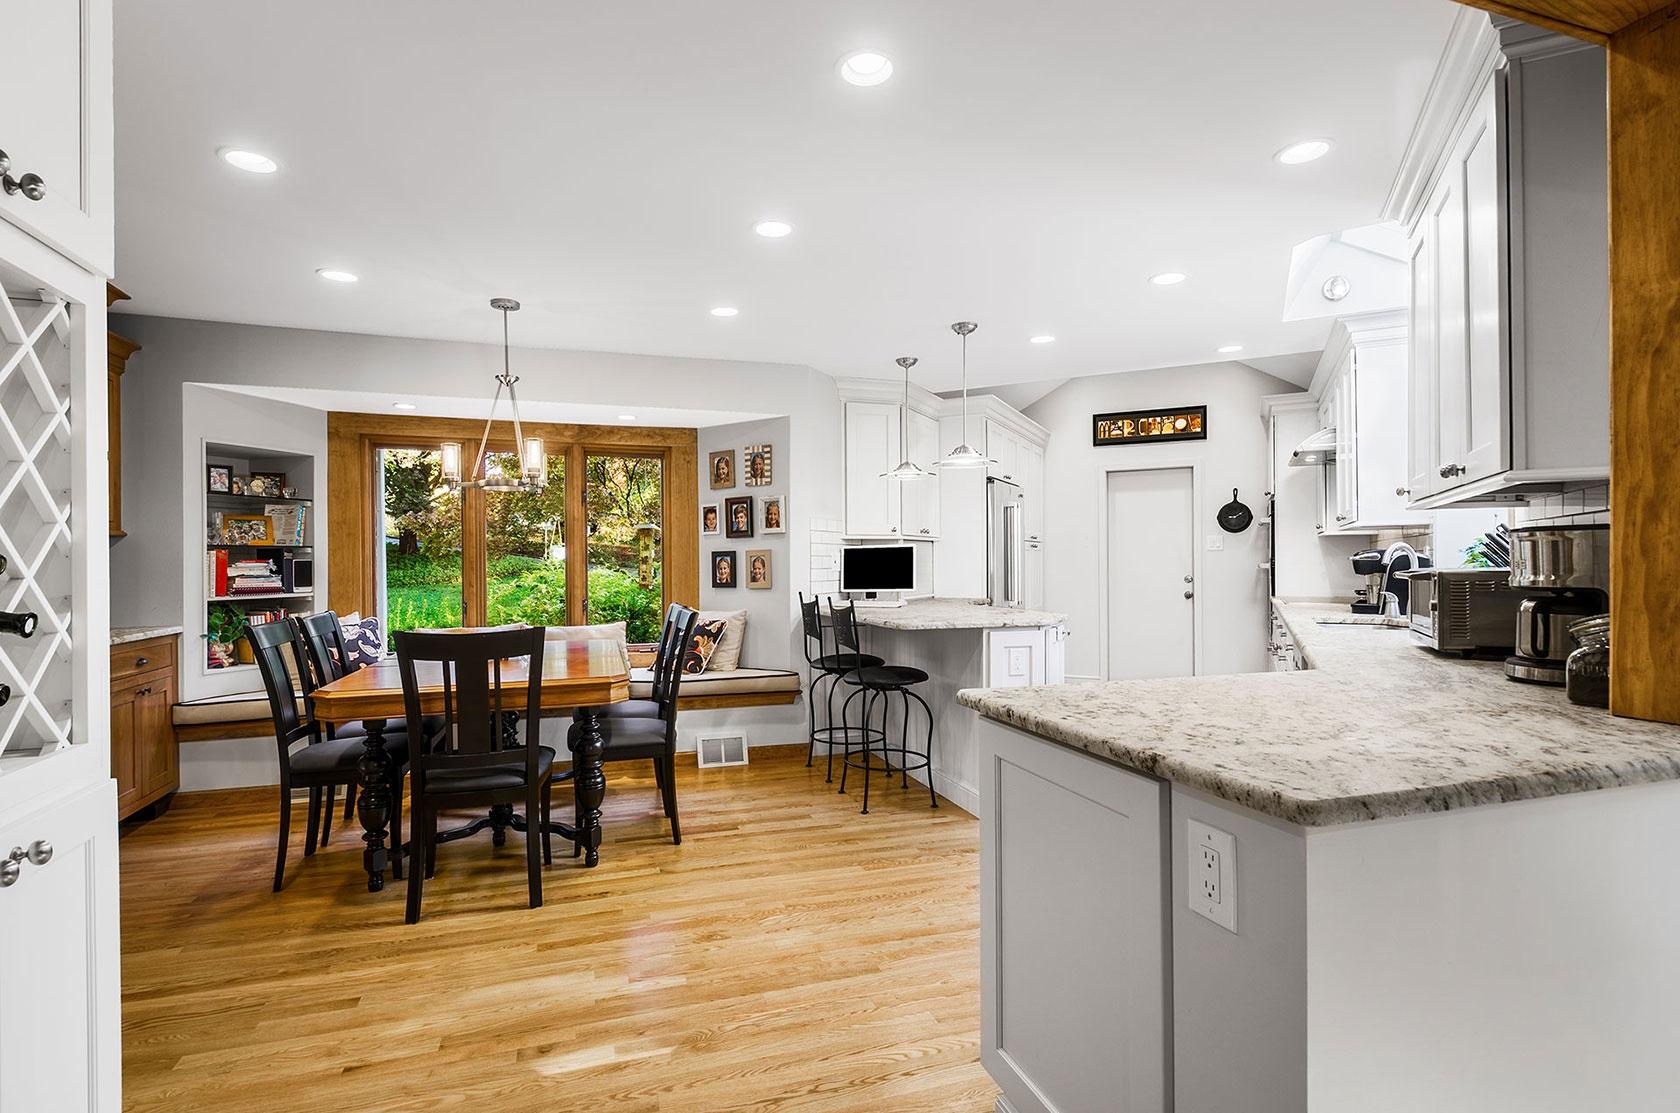 Habitat Design Kitchen & Bath (@habitatdesignskb) Cover Image